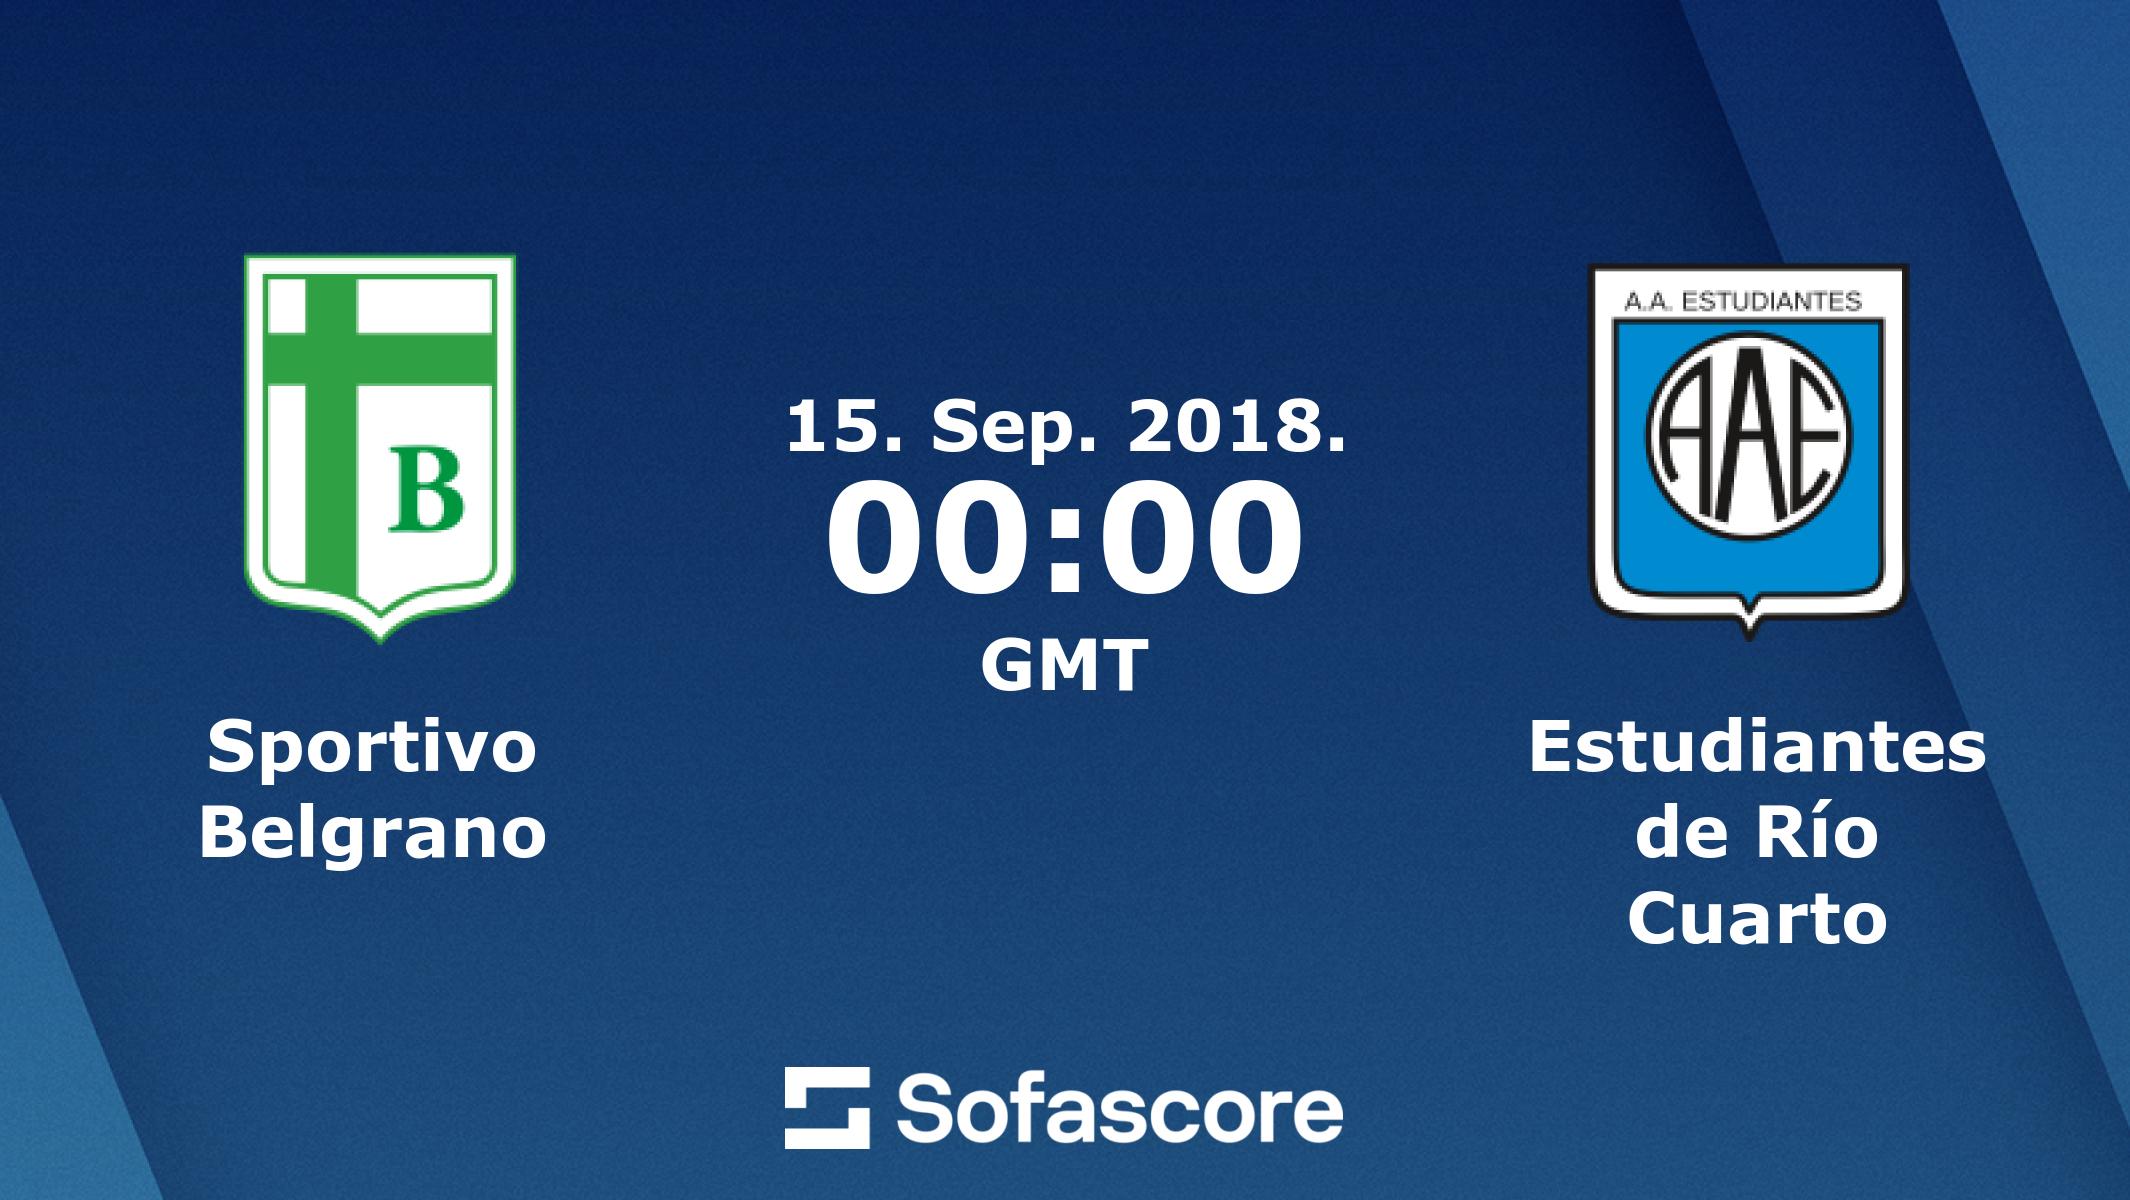 Sportivo Belgrano Estudiantes Rio Cuarto Live Ticker und Live Stream ...